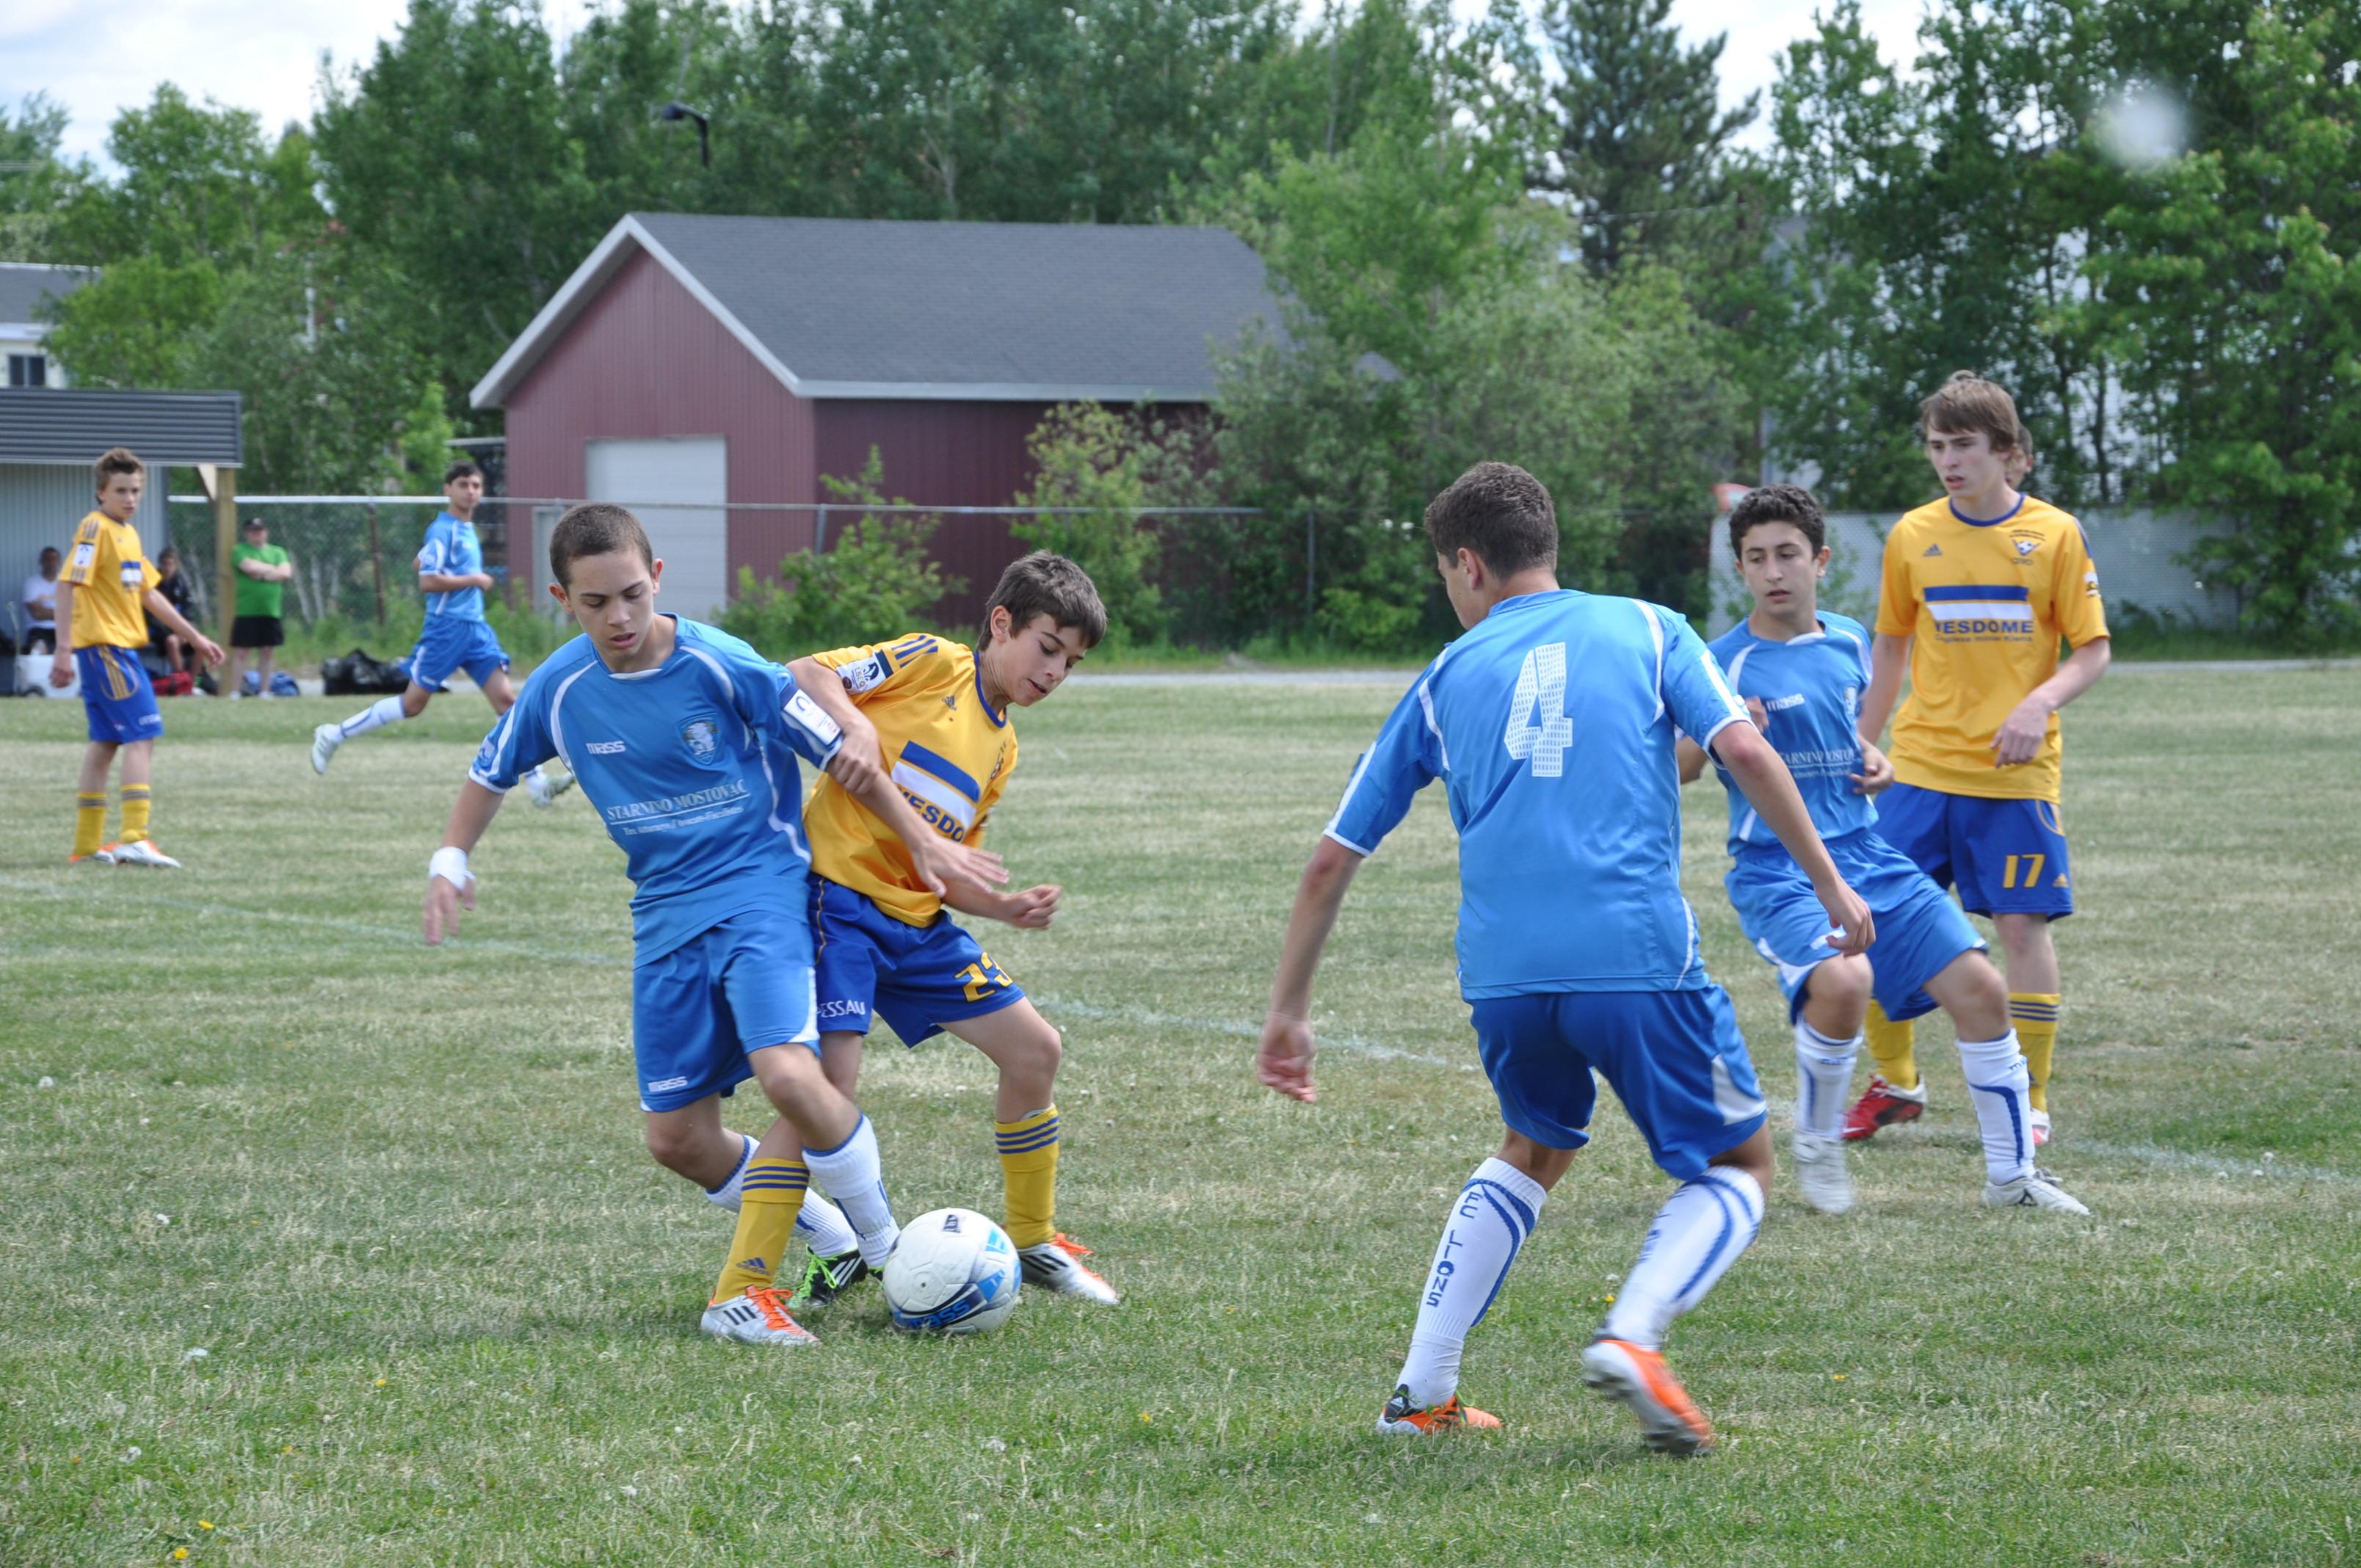 Blizz'Or - Club soccer Vallée-de-l'Or